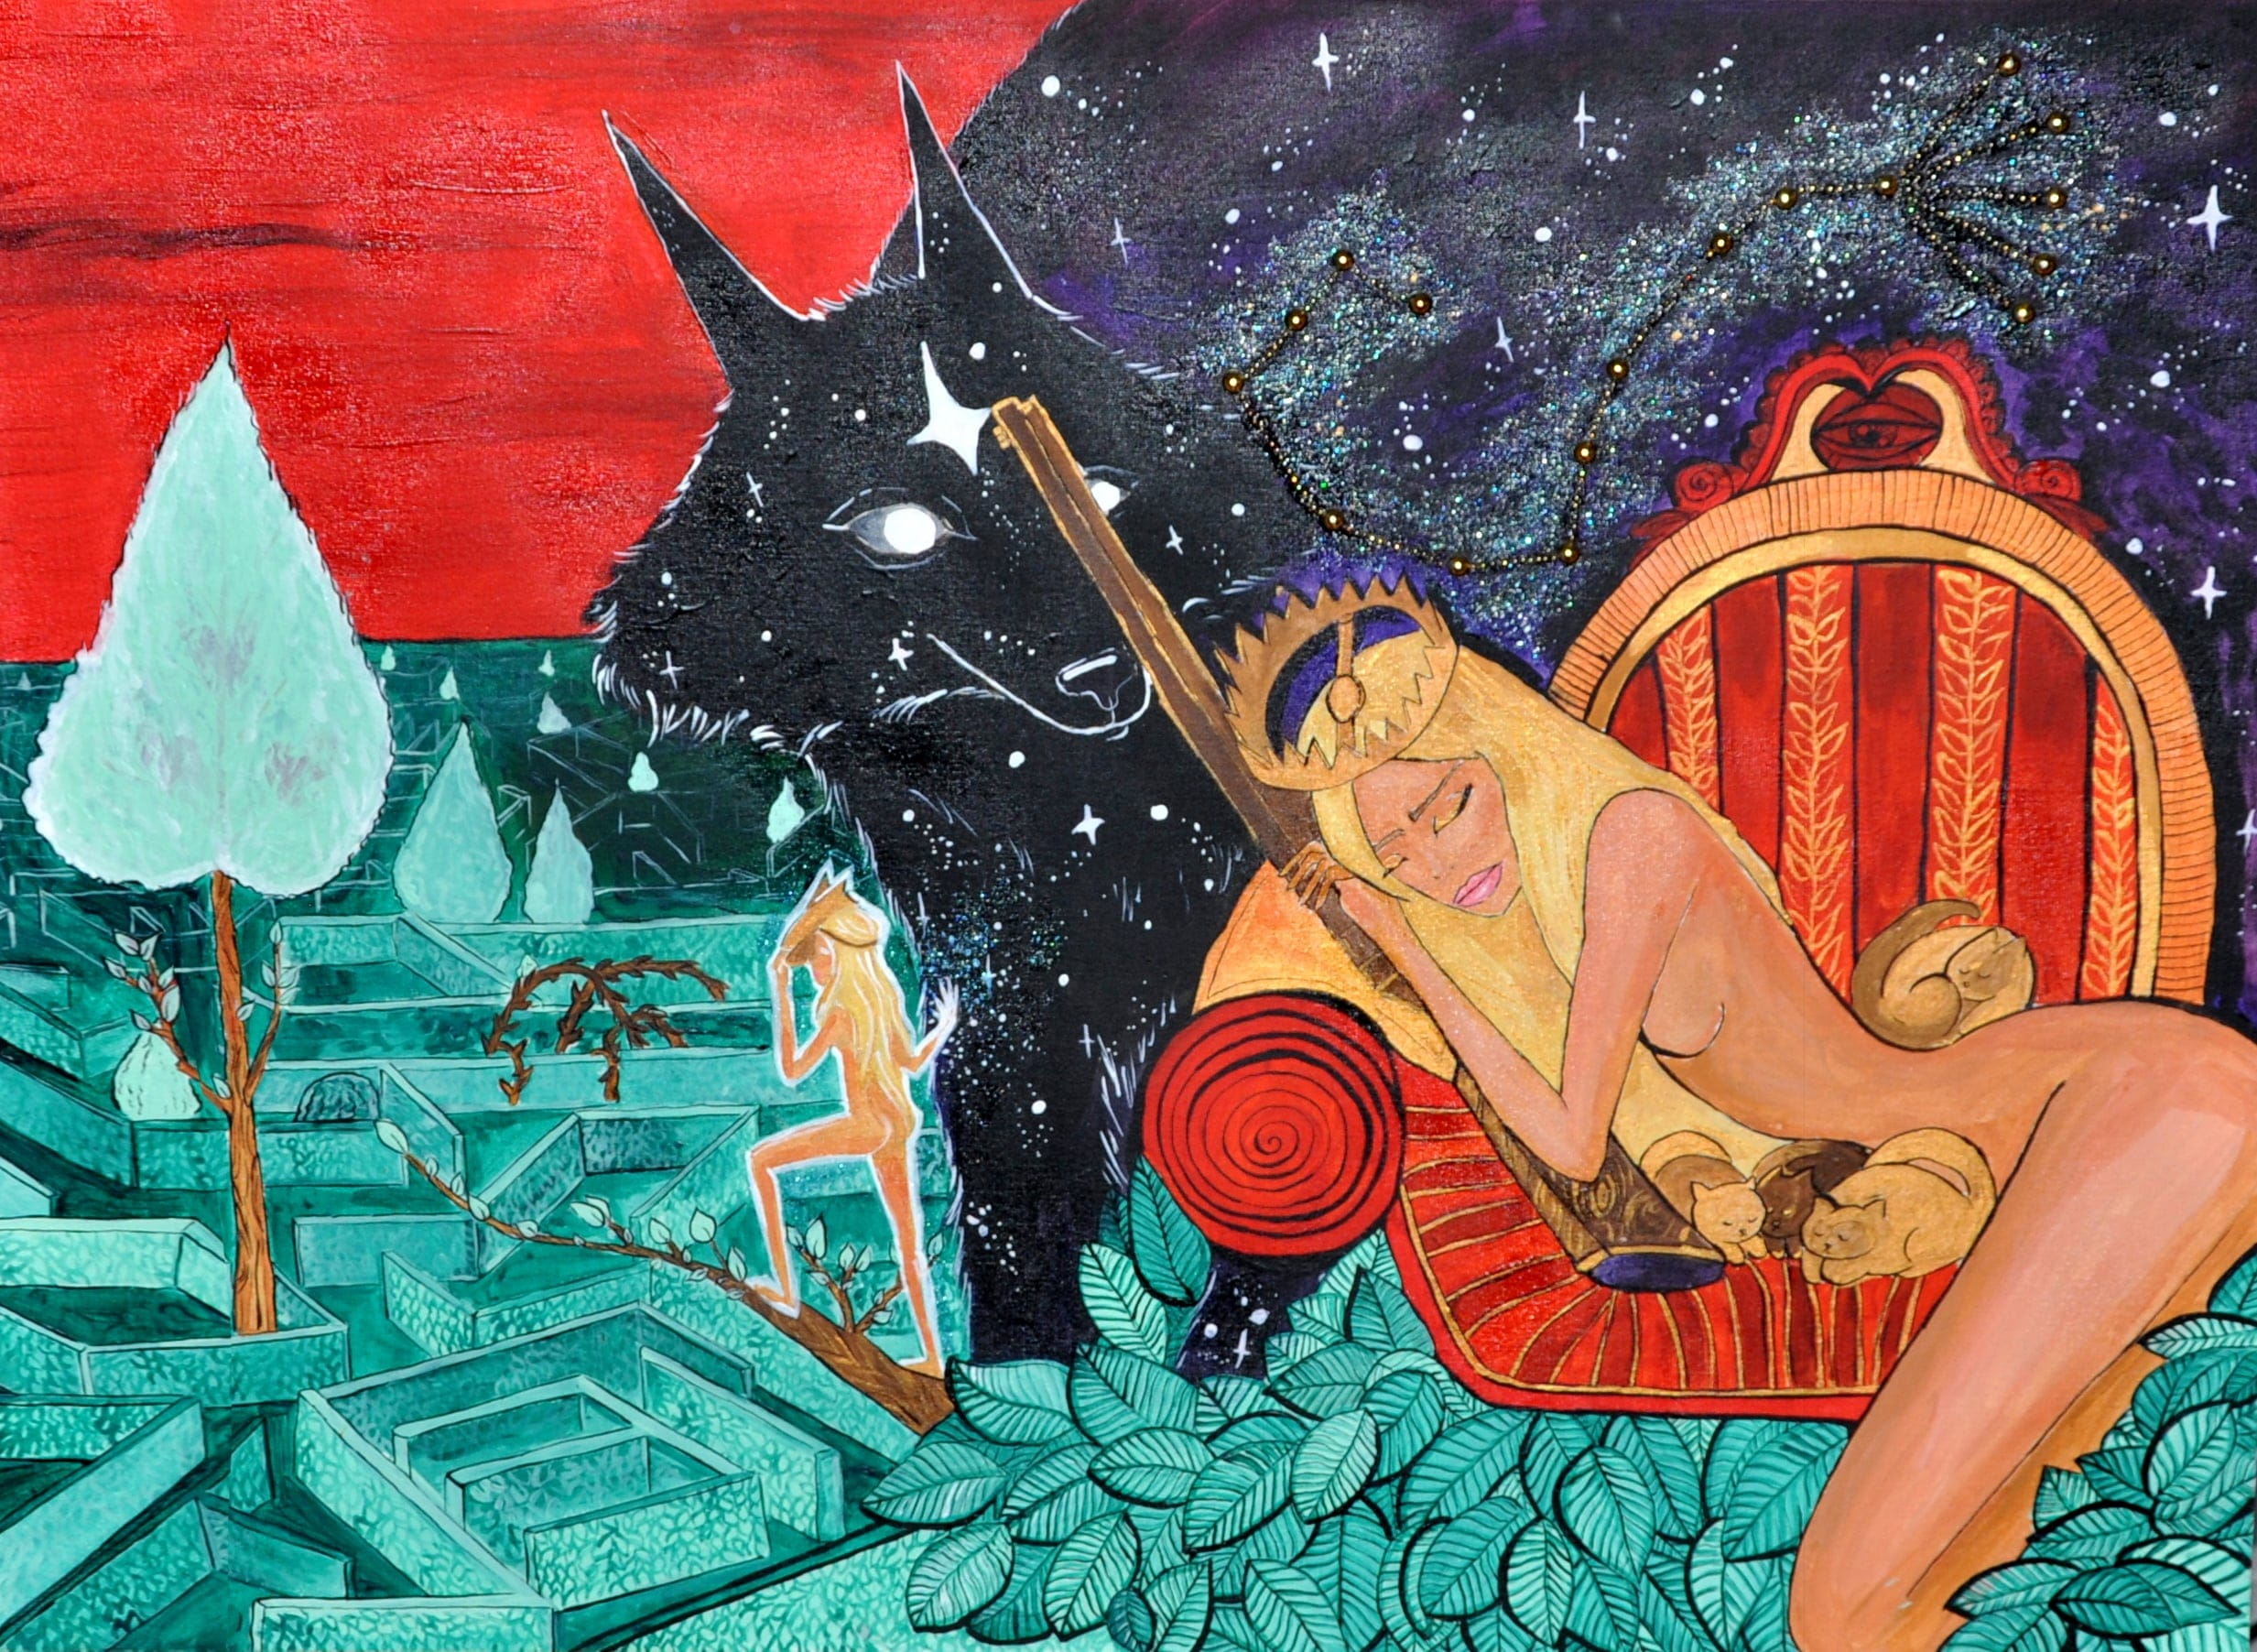 about author Art for sale, Kateryna Fedorova, illustrator, artkatana, art-katana, erotic girls, order art online, new art online1-min-min